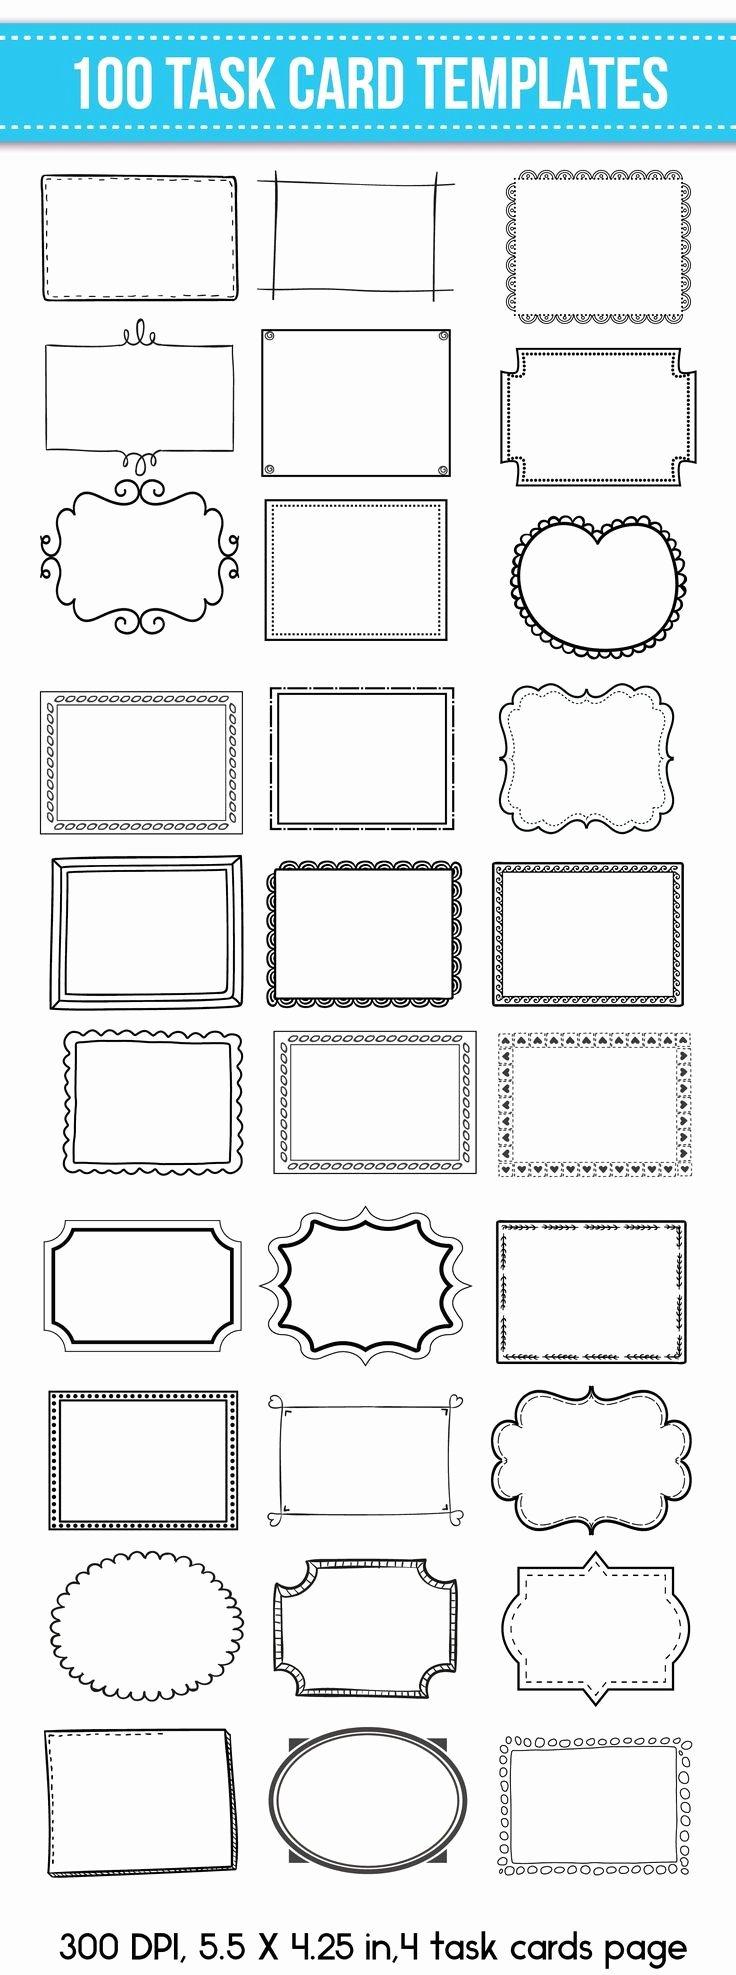 Free Blogger Templates for Teachers Lovely 100 Task Card Templates Flash Card Templates Editable for Mercial Use Editable Task Cards